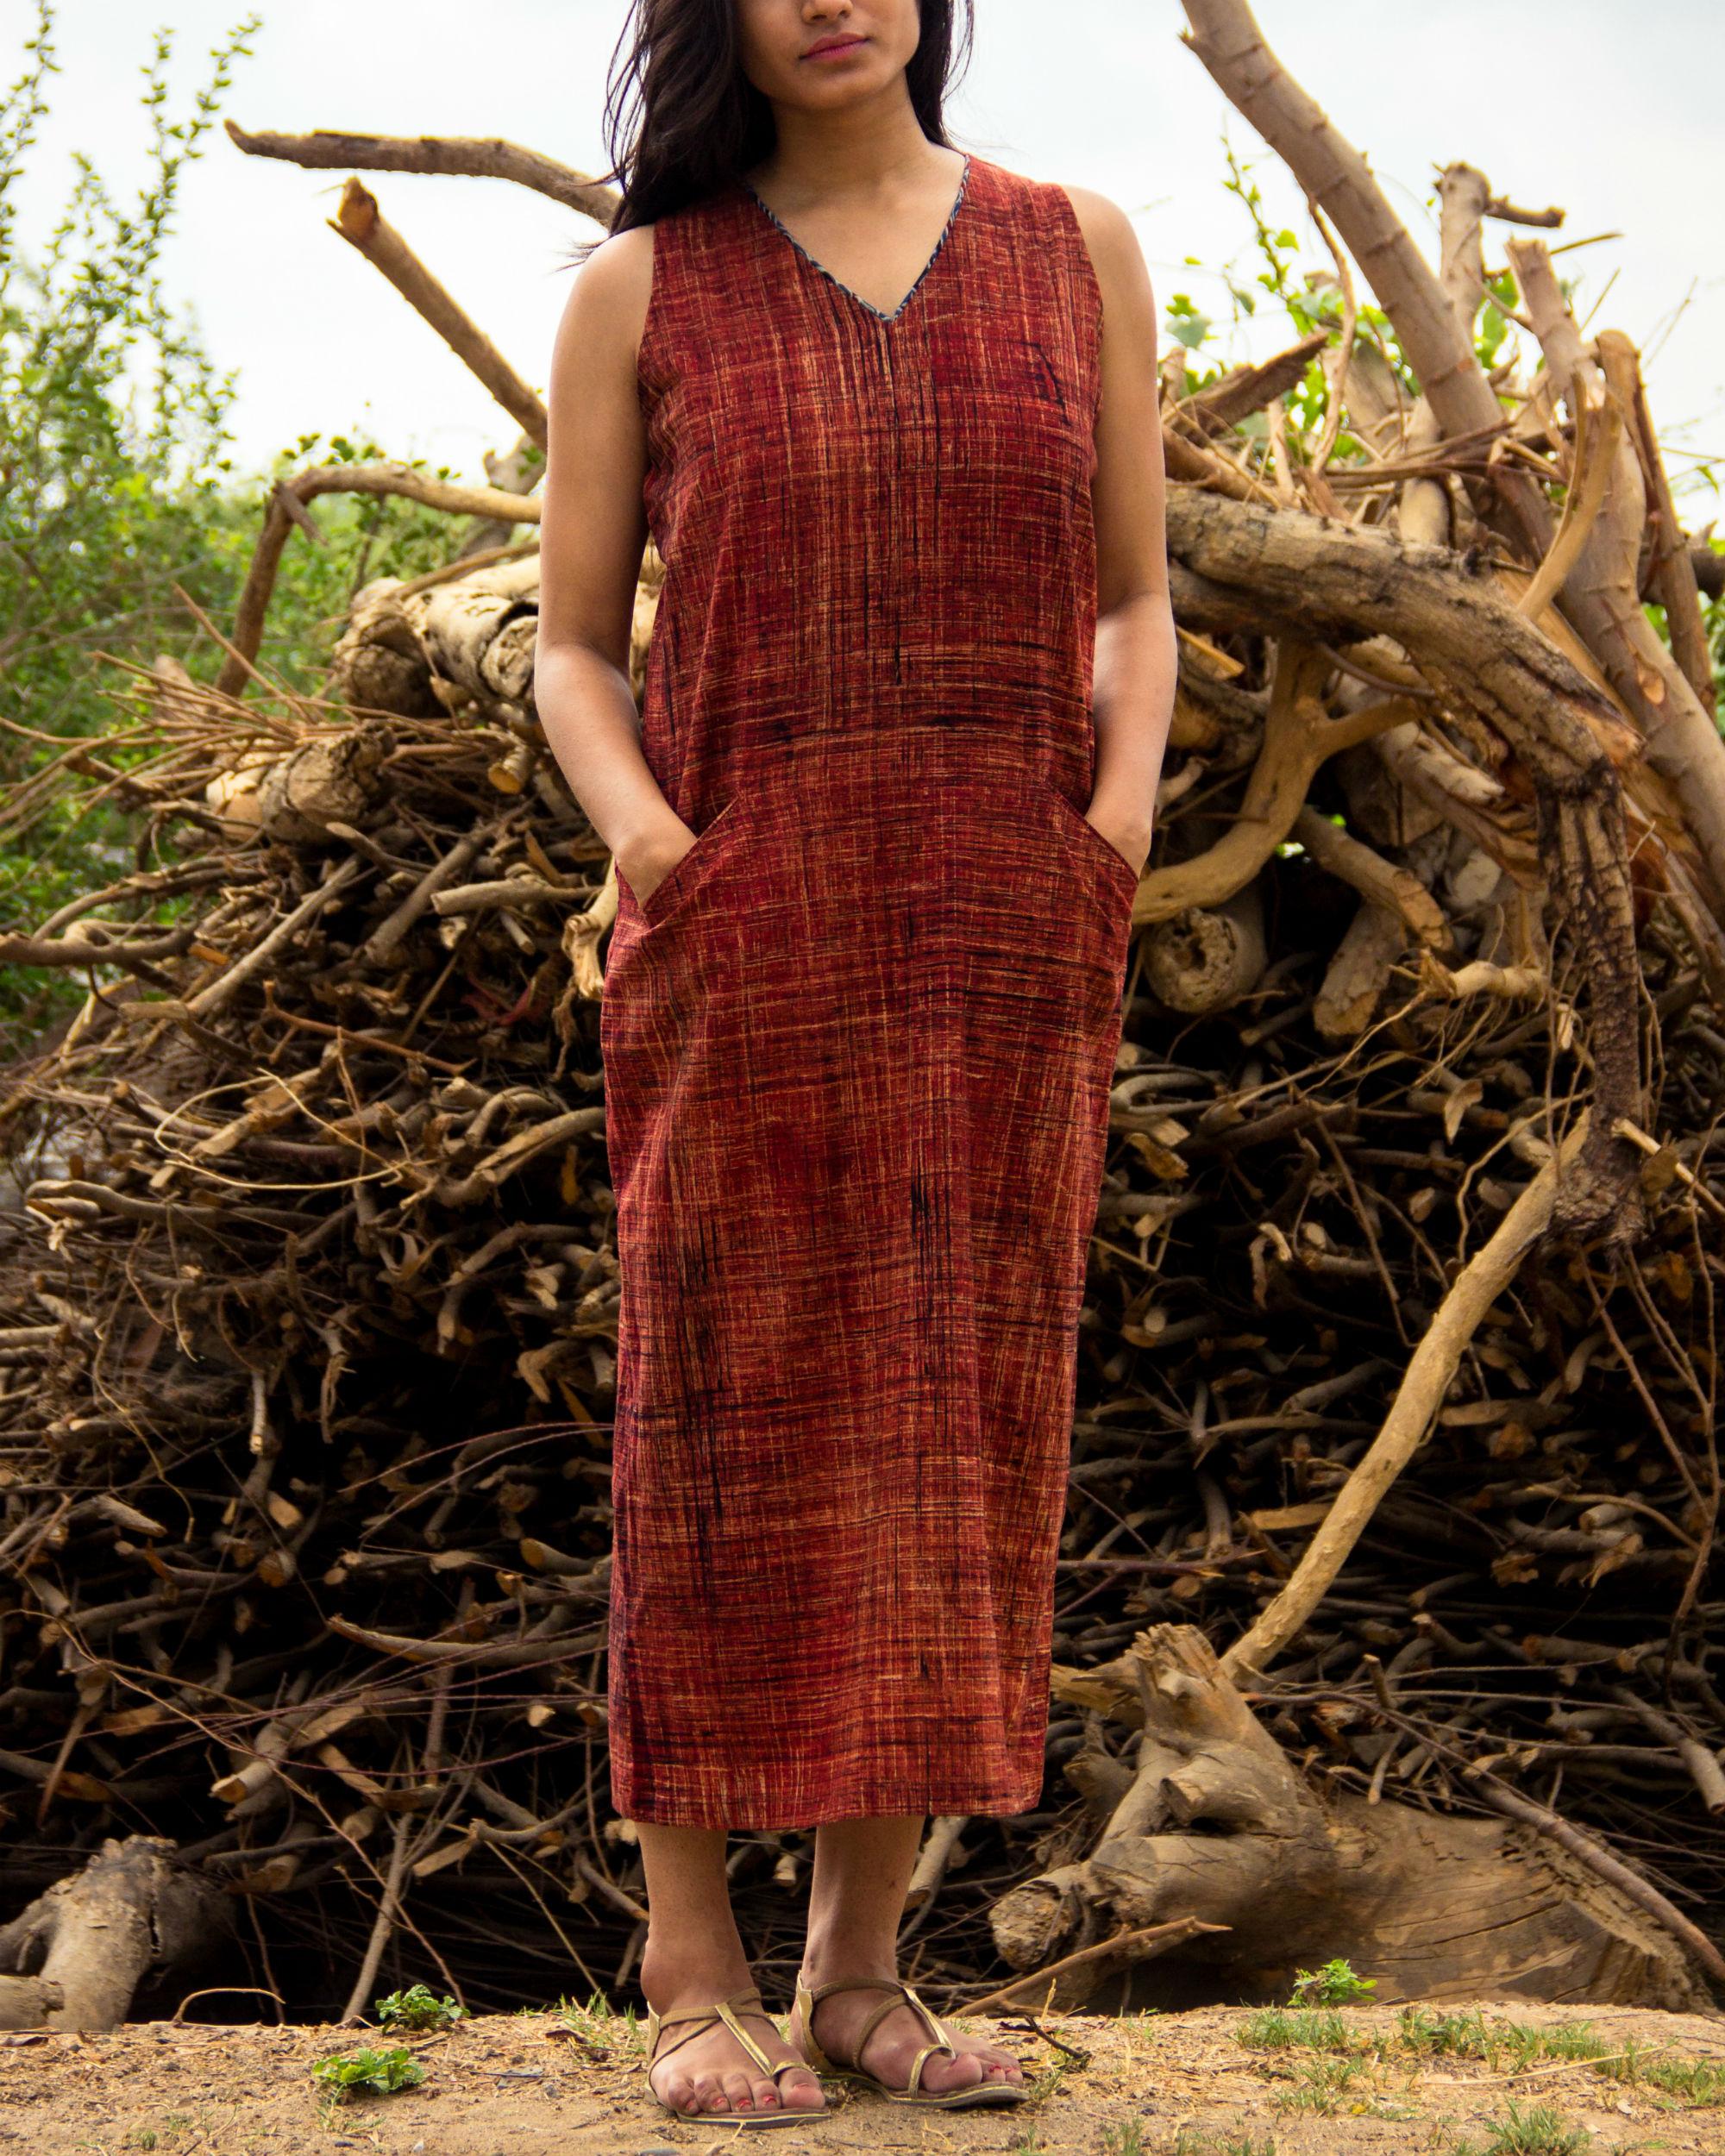 Brown ankle length dress